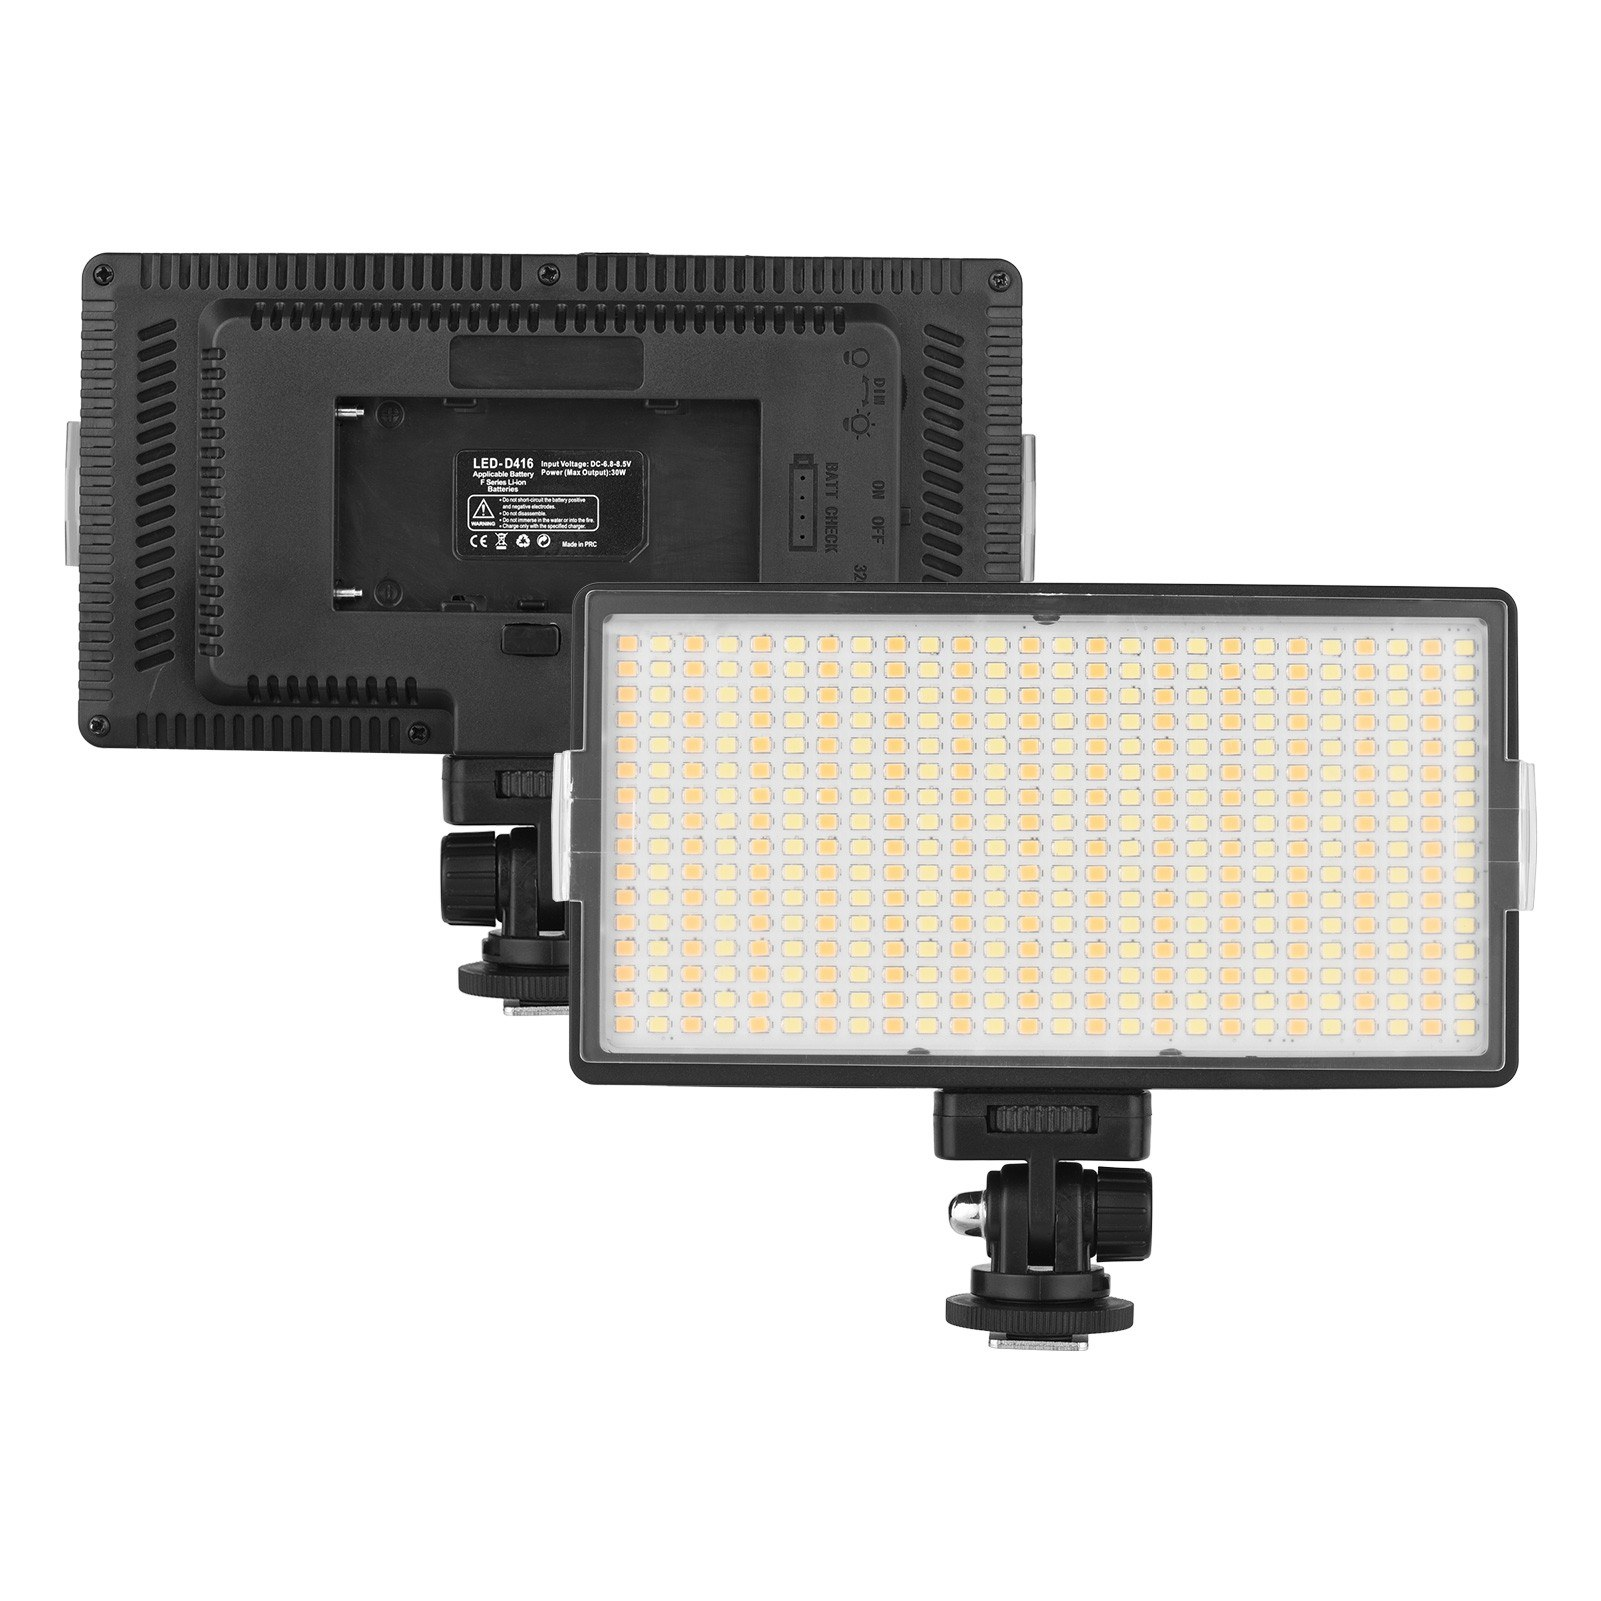 52% OFF Andoer LED-416 LED Video Light, Free Shipping $23.99